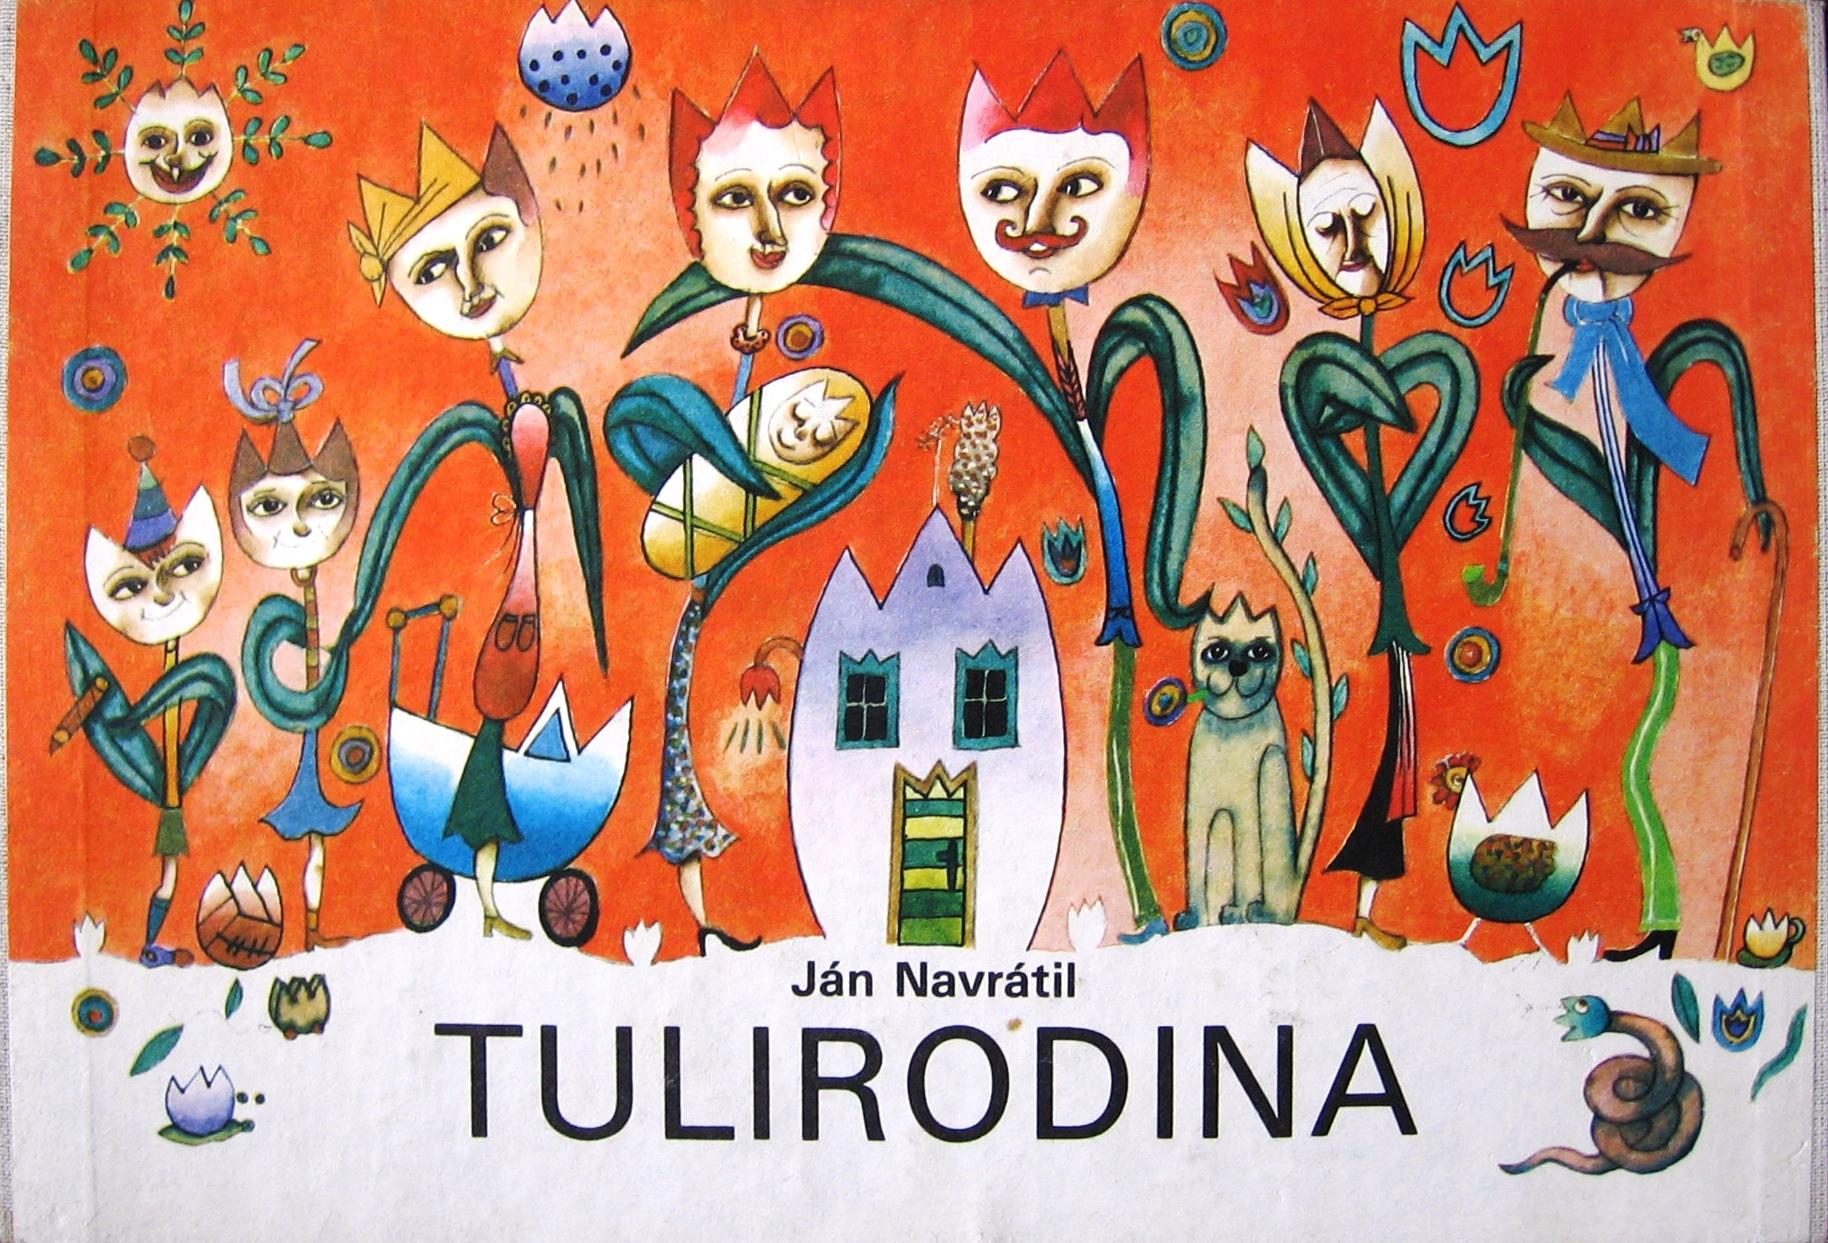 Tulirodina